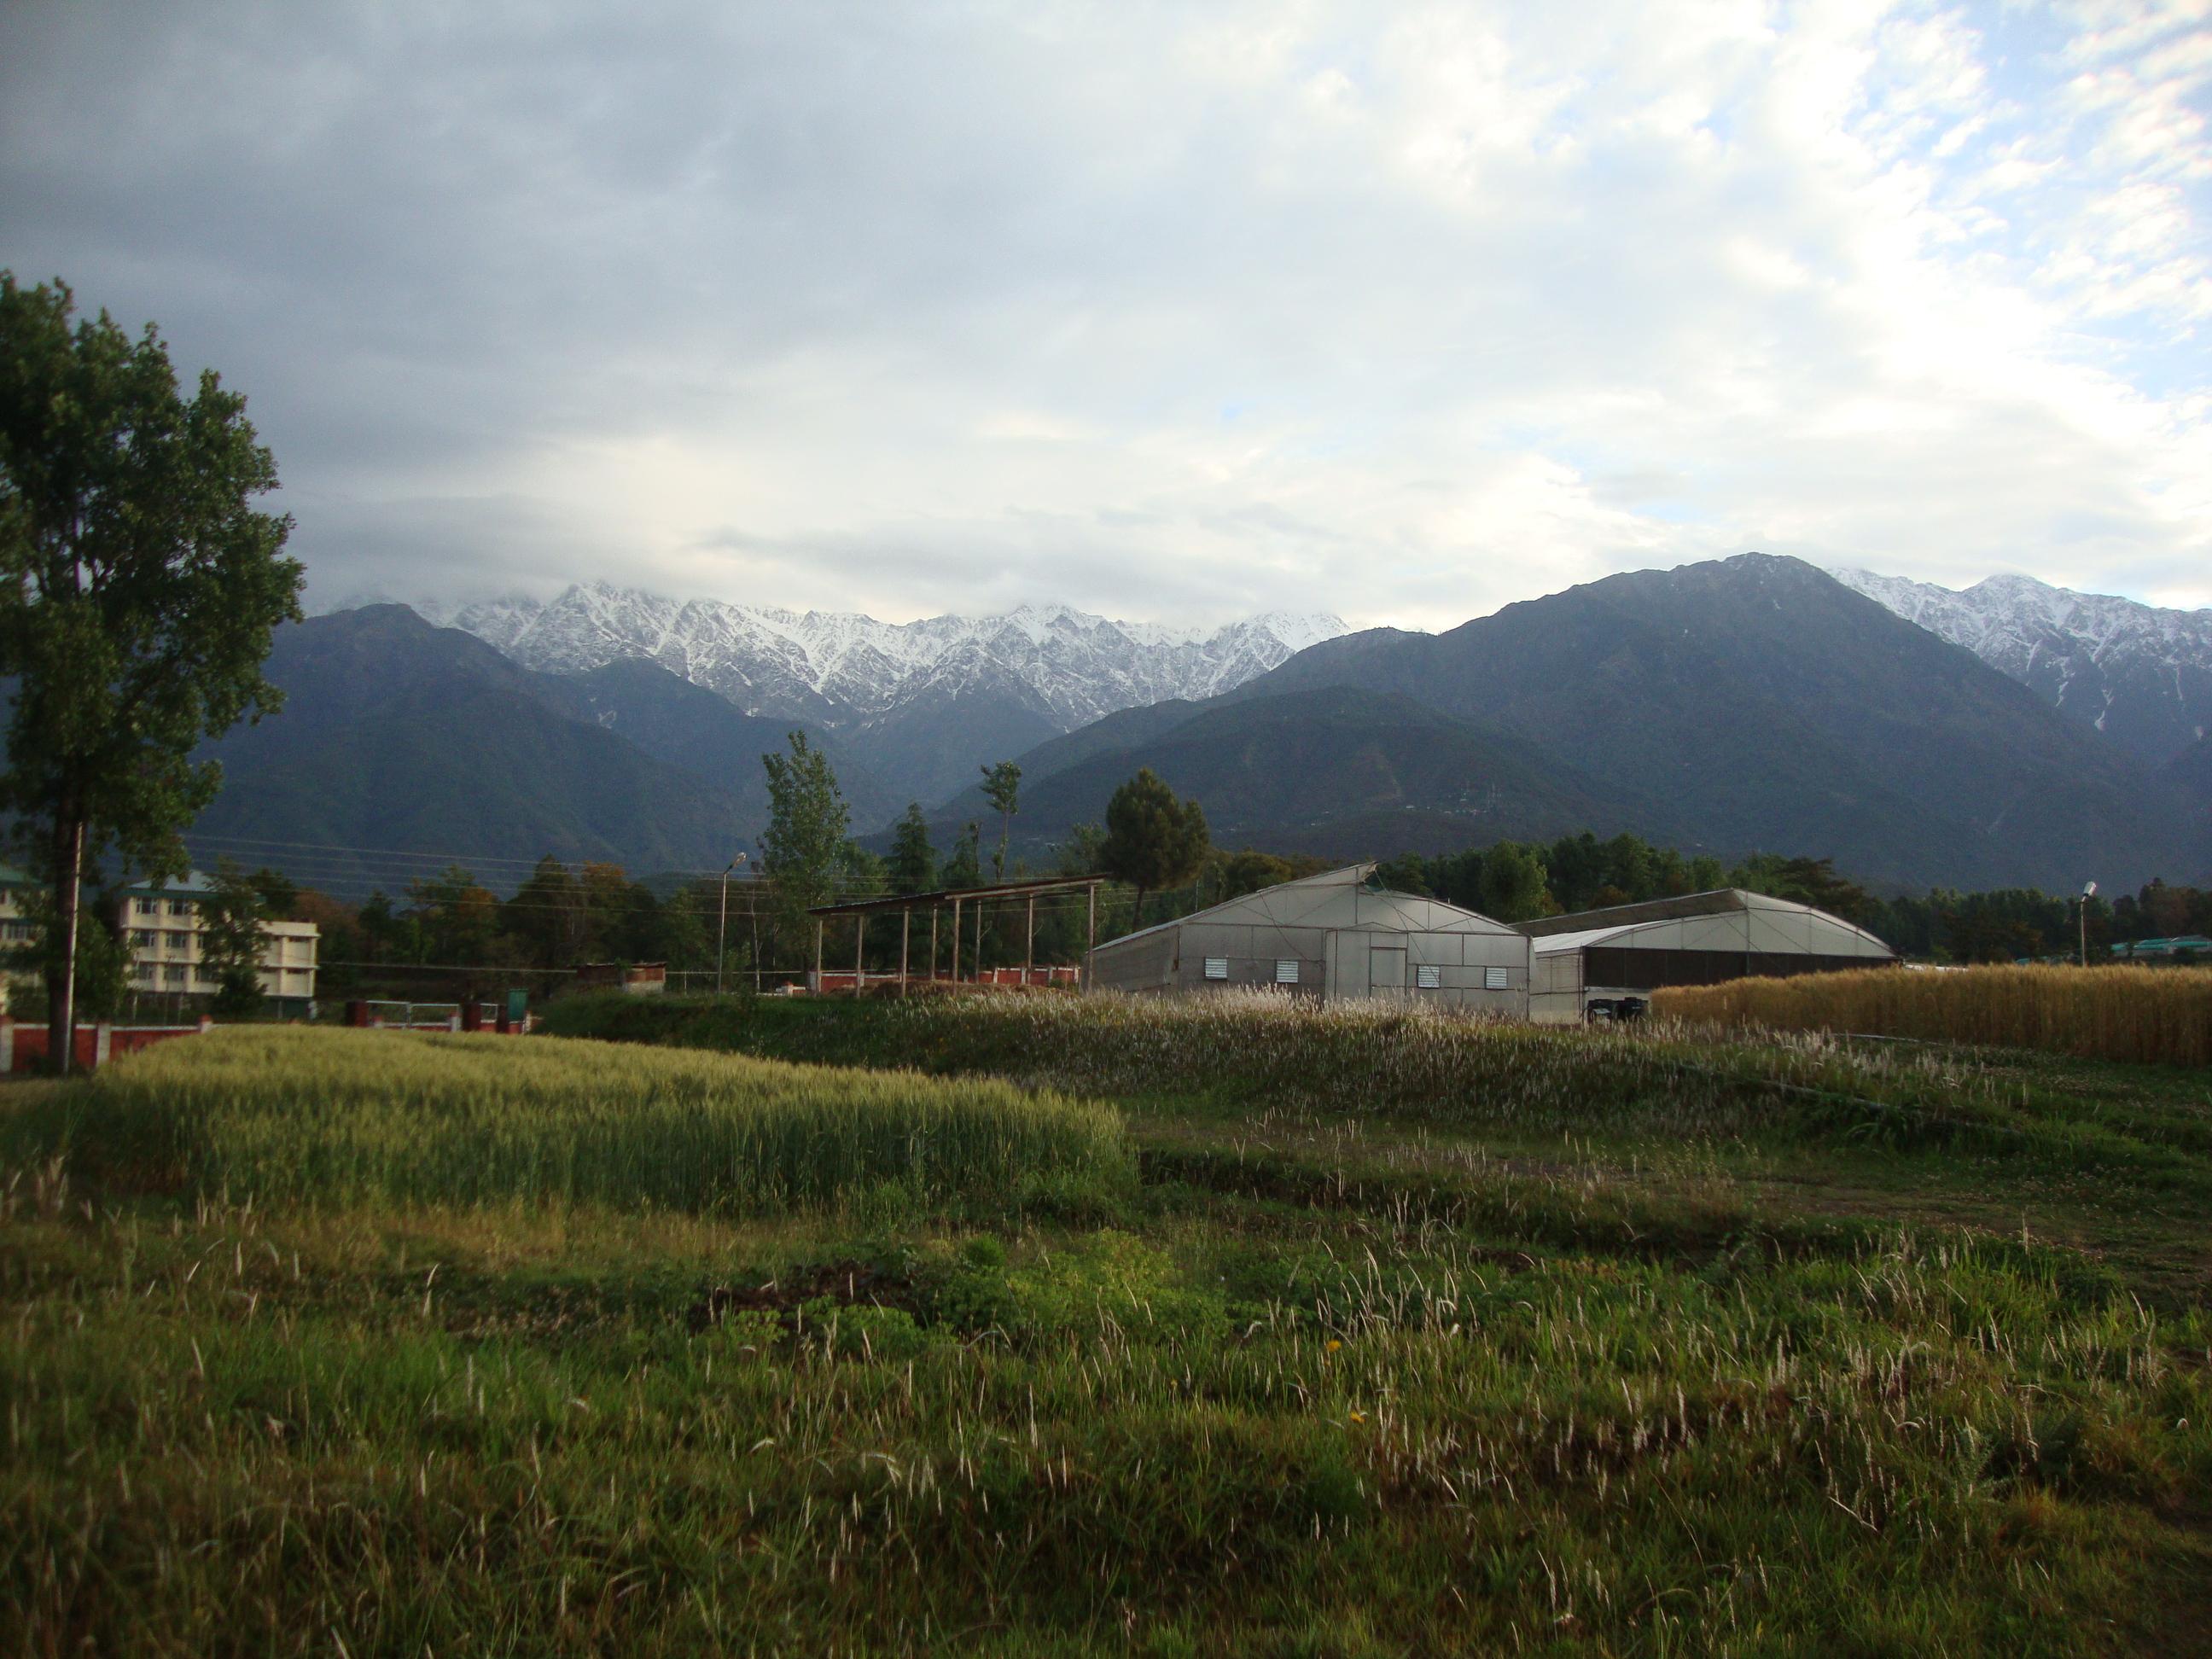 Csk Hp Agricultural University Palampur Himachal Pradesh